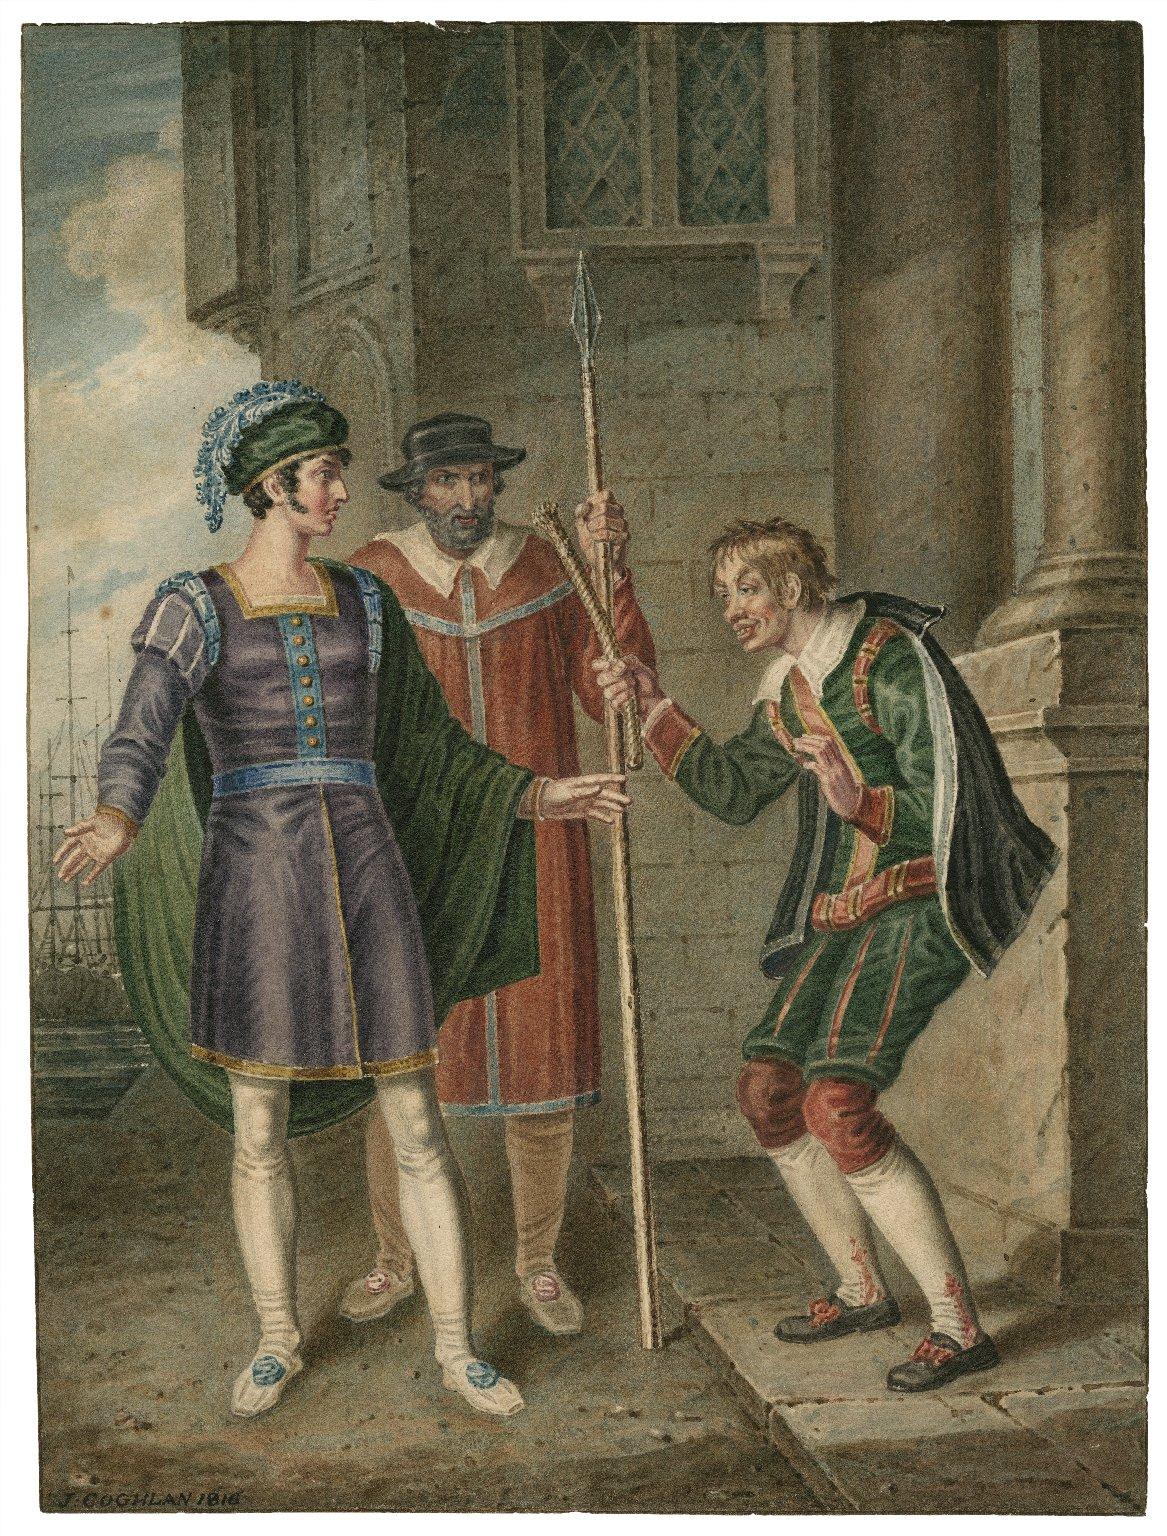 [Comedy of errors, IV, 1, Antipholus of Ephesus, an officer and Dromio of Ephesus] [graphic] / J. Coghlan.